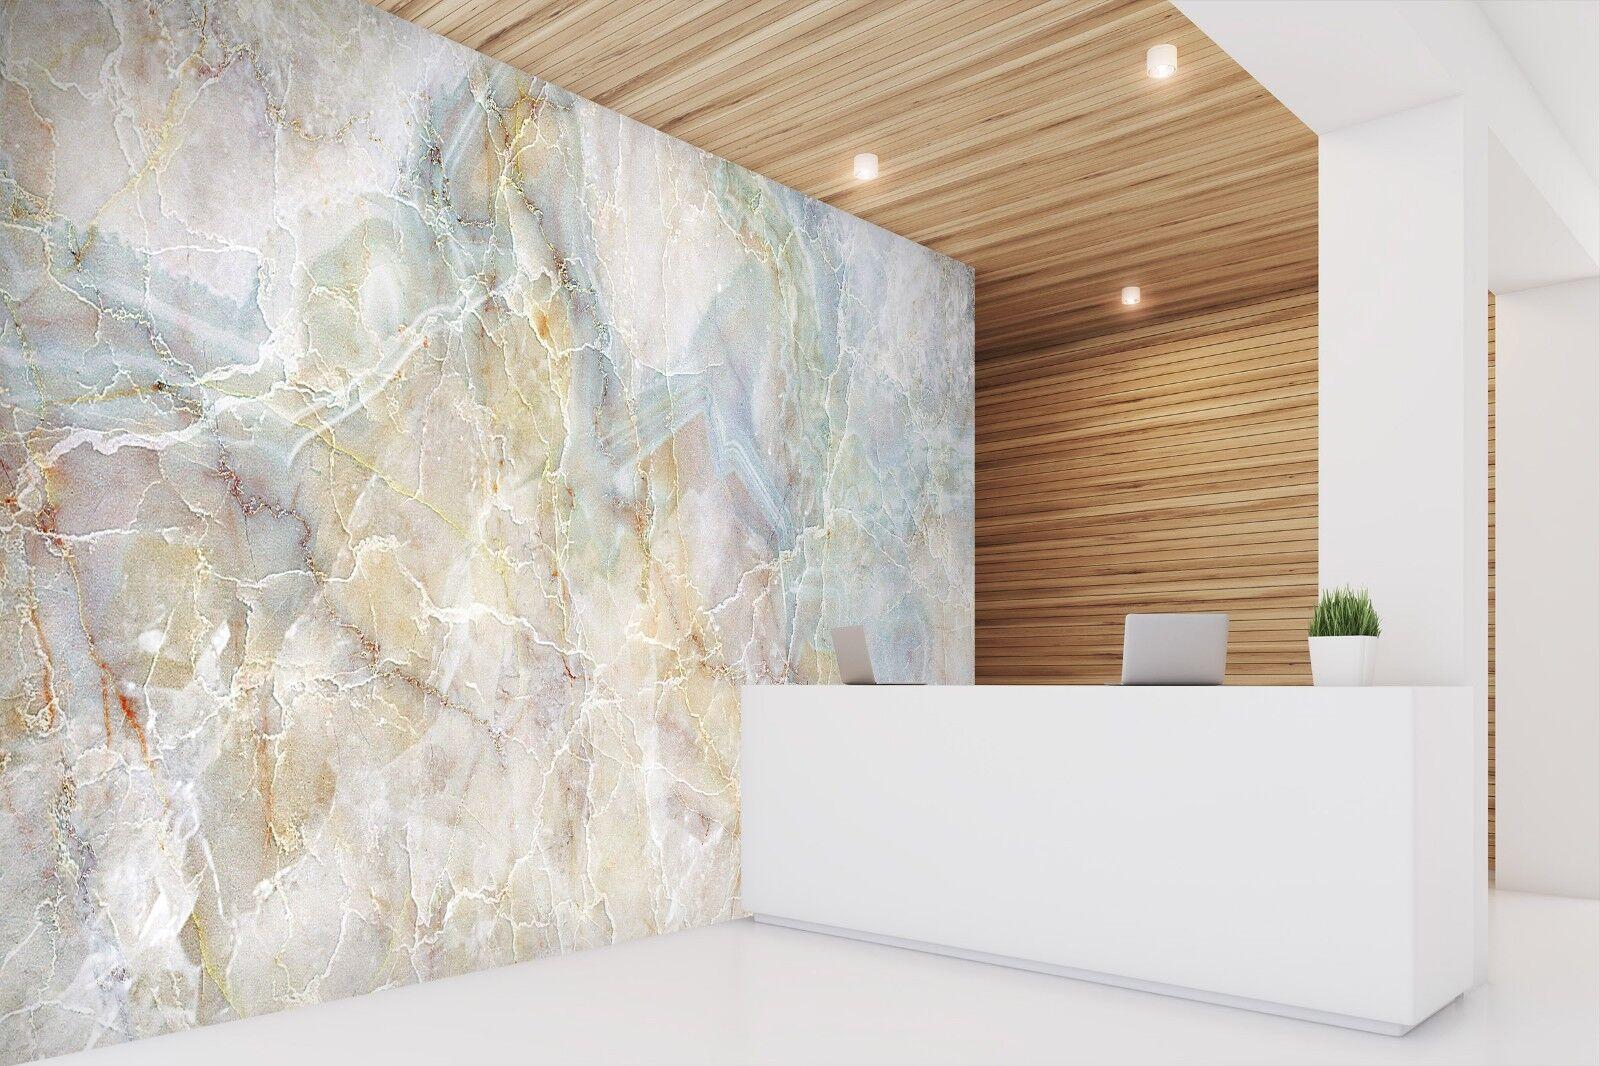 3D Natural Marble 1 Texture Tiles Marble Wall Paper Decal Wallpaper Mural AJ UK